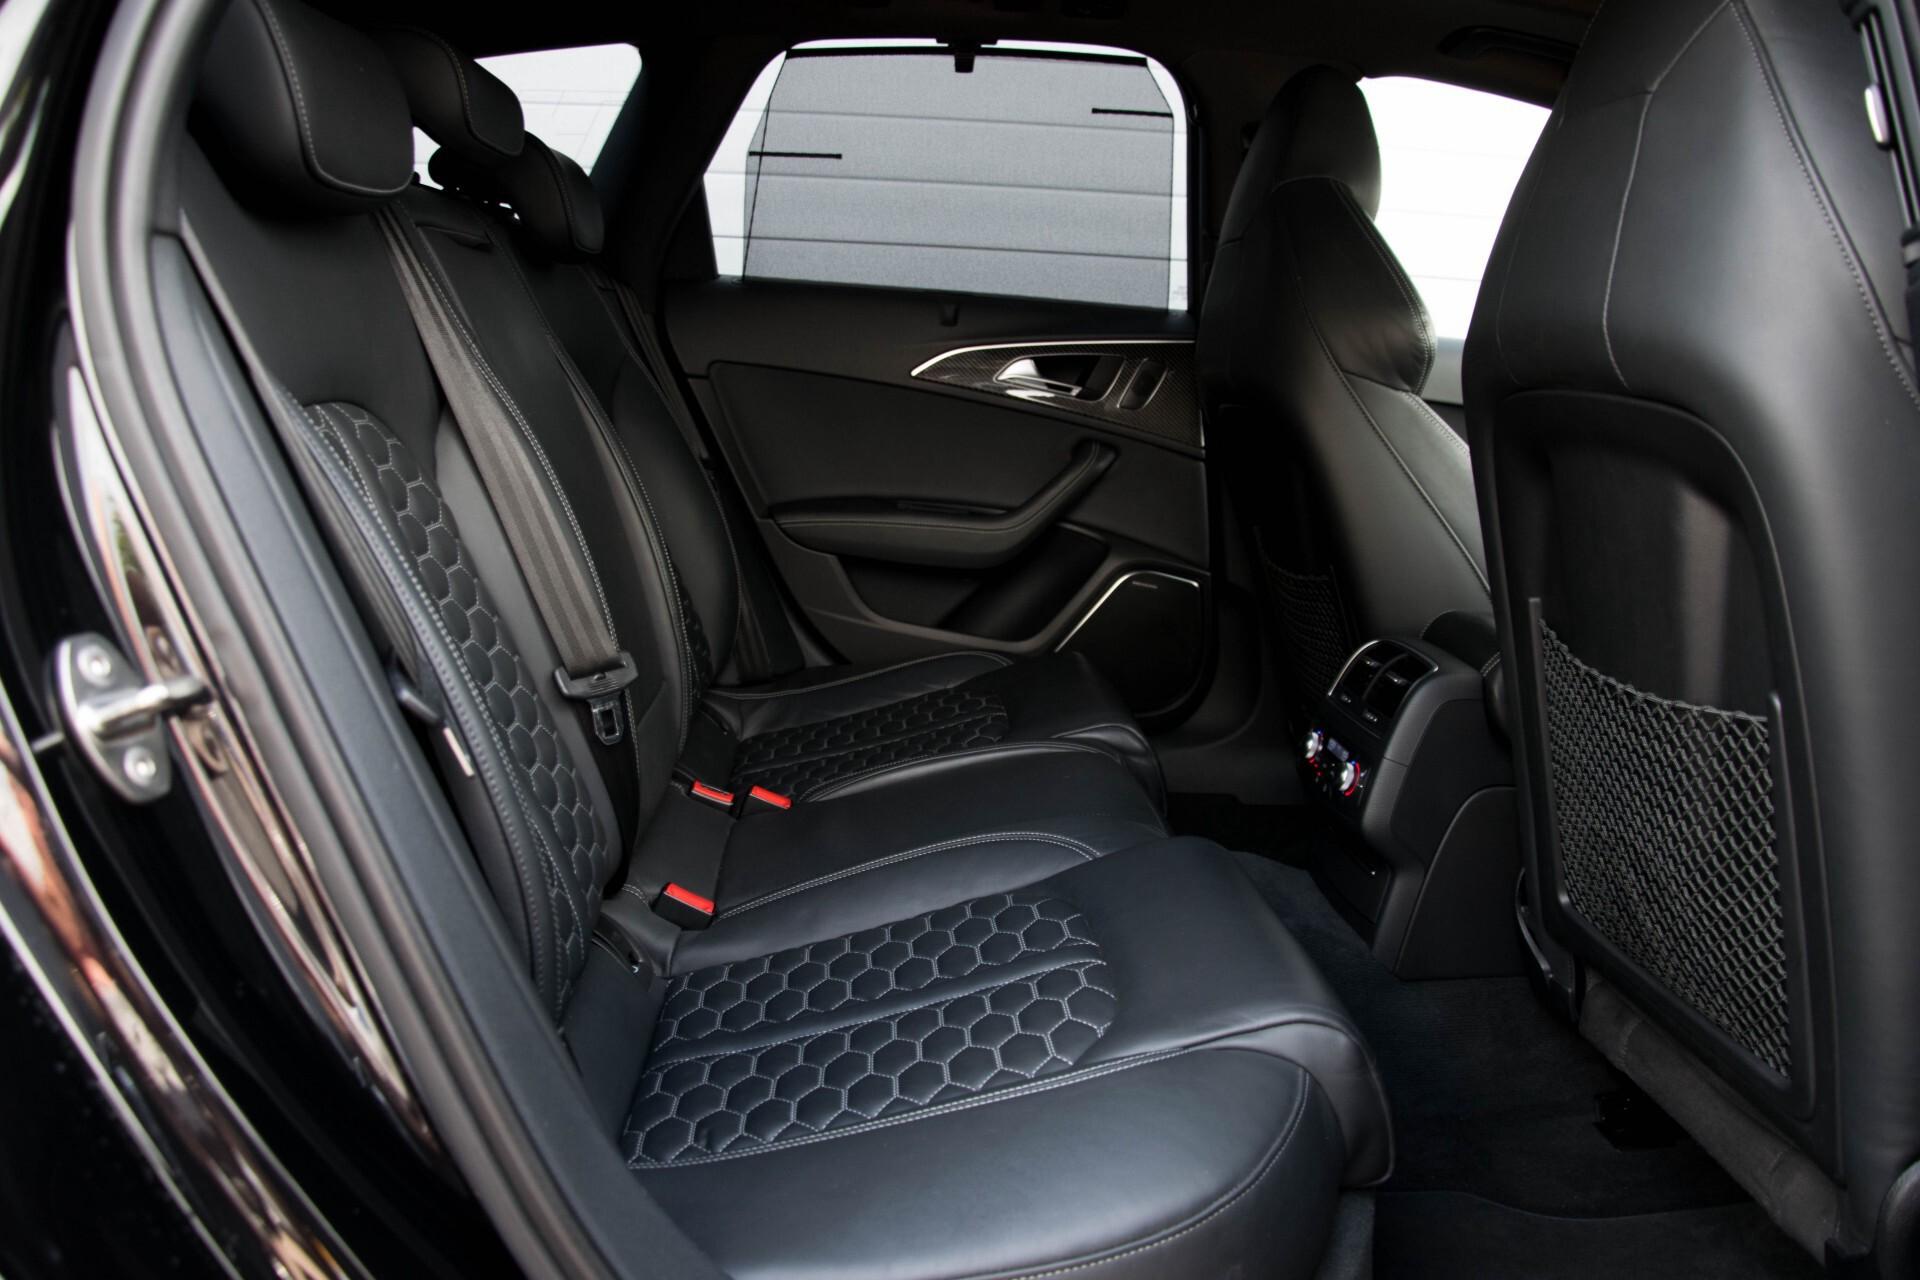 Audi RS6 Avant 4.0 TFSI Quattro B&O/Carbon/Head-Up/Nachtzicht/Exclusive/Camera/Keyless/Pano Aut8 Foto 4